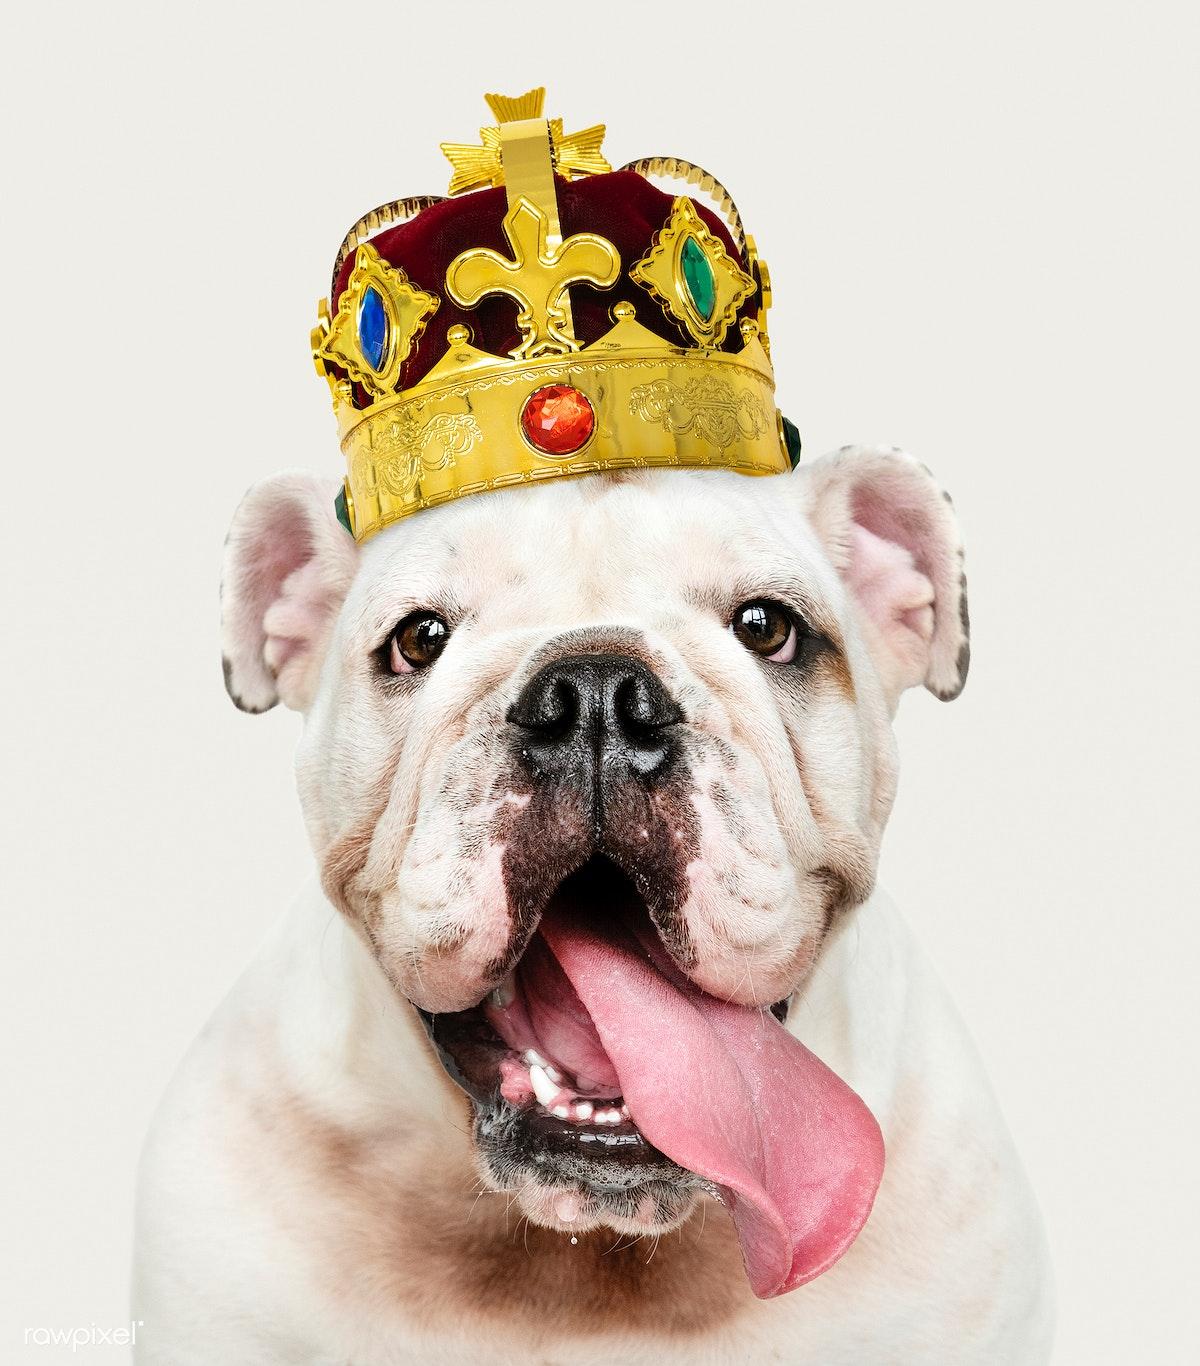 Download premium image of Cute white English Bulldog puppy in a classic